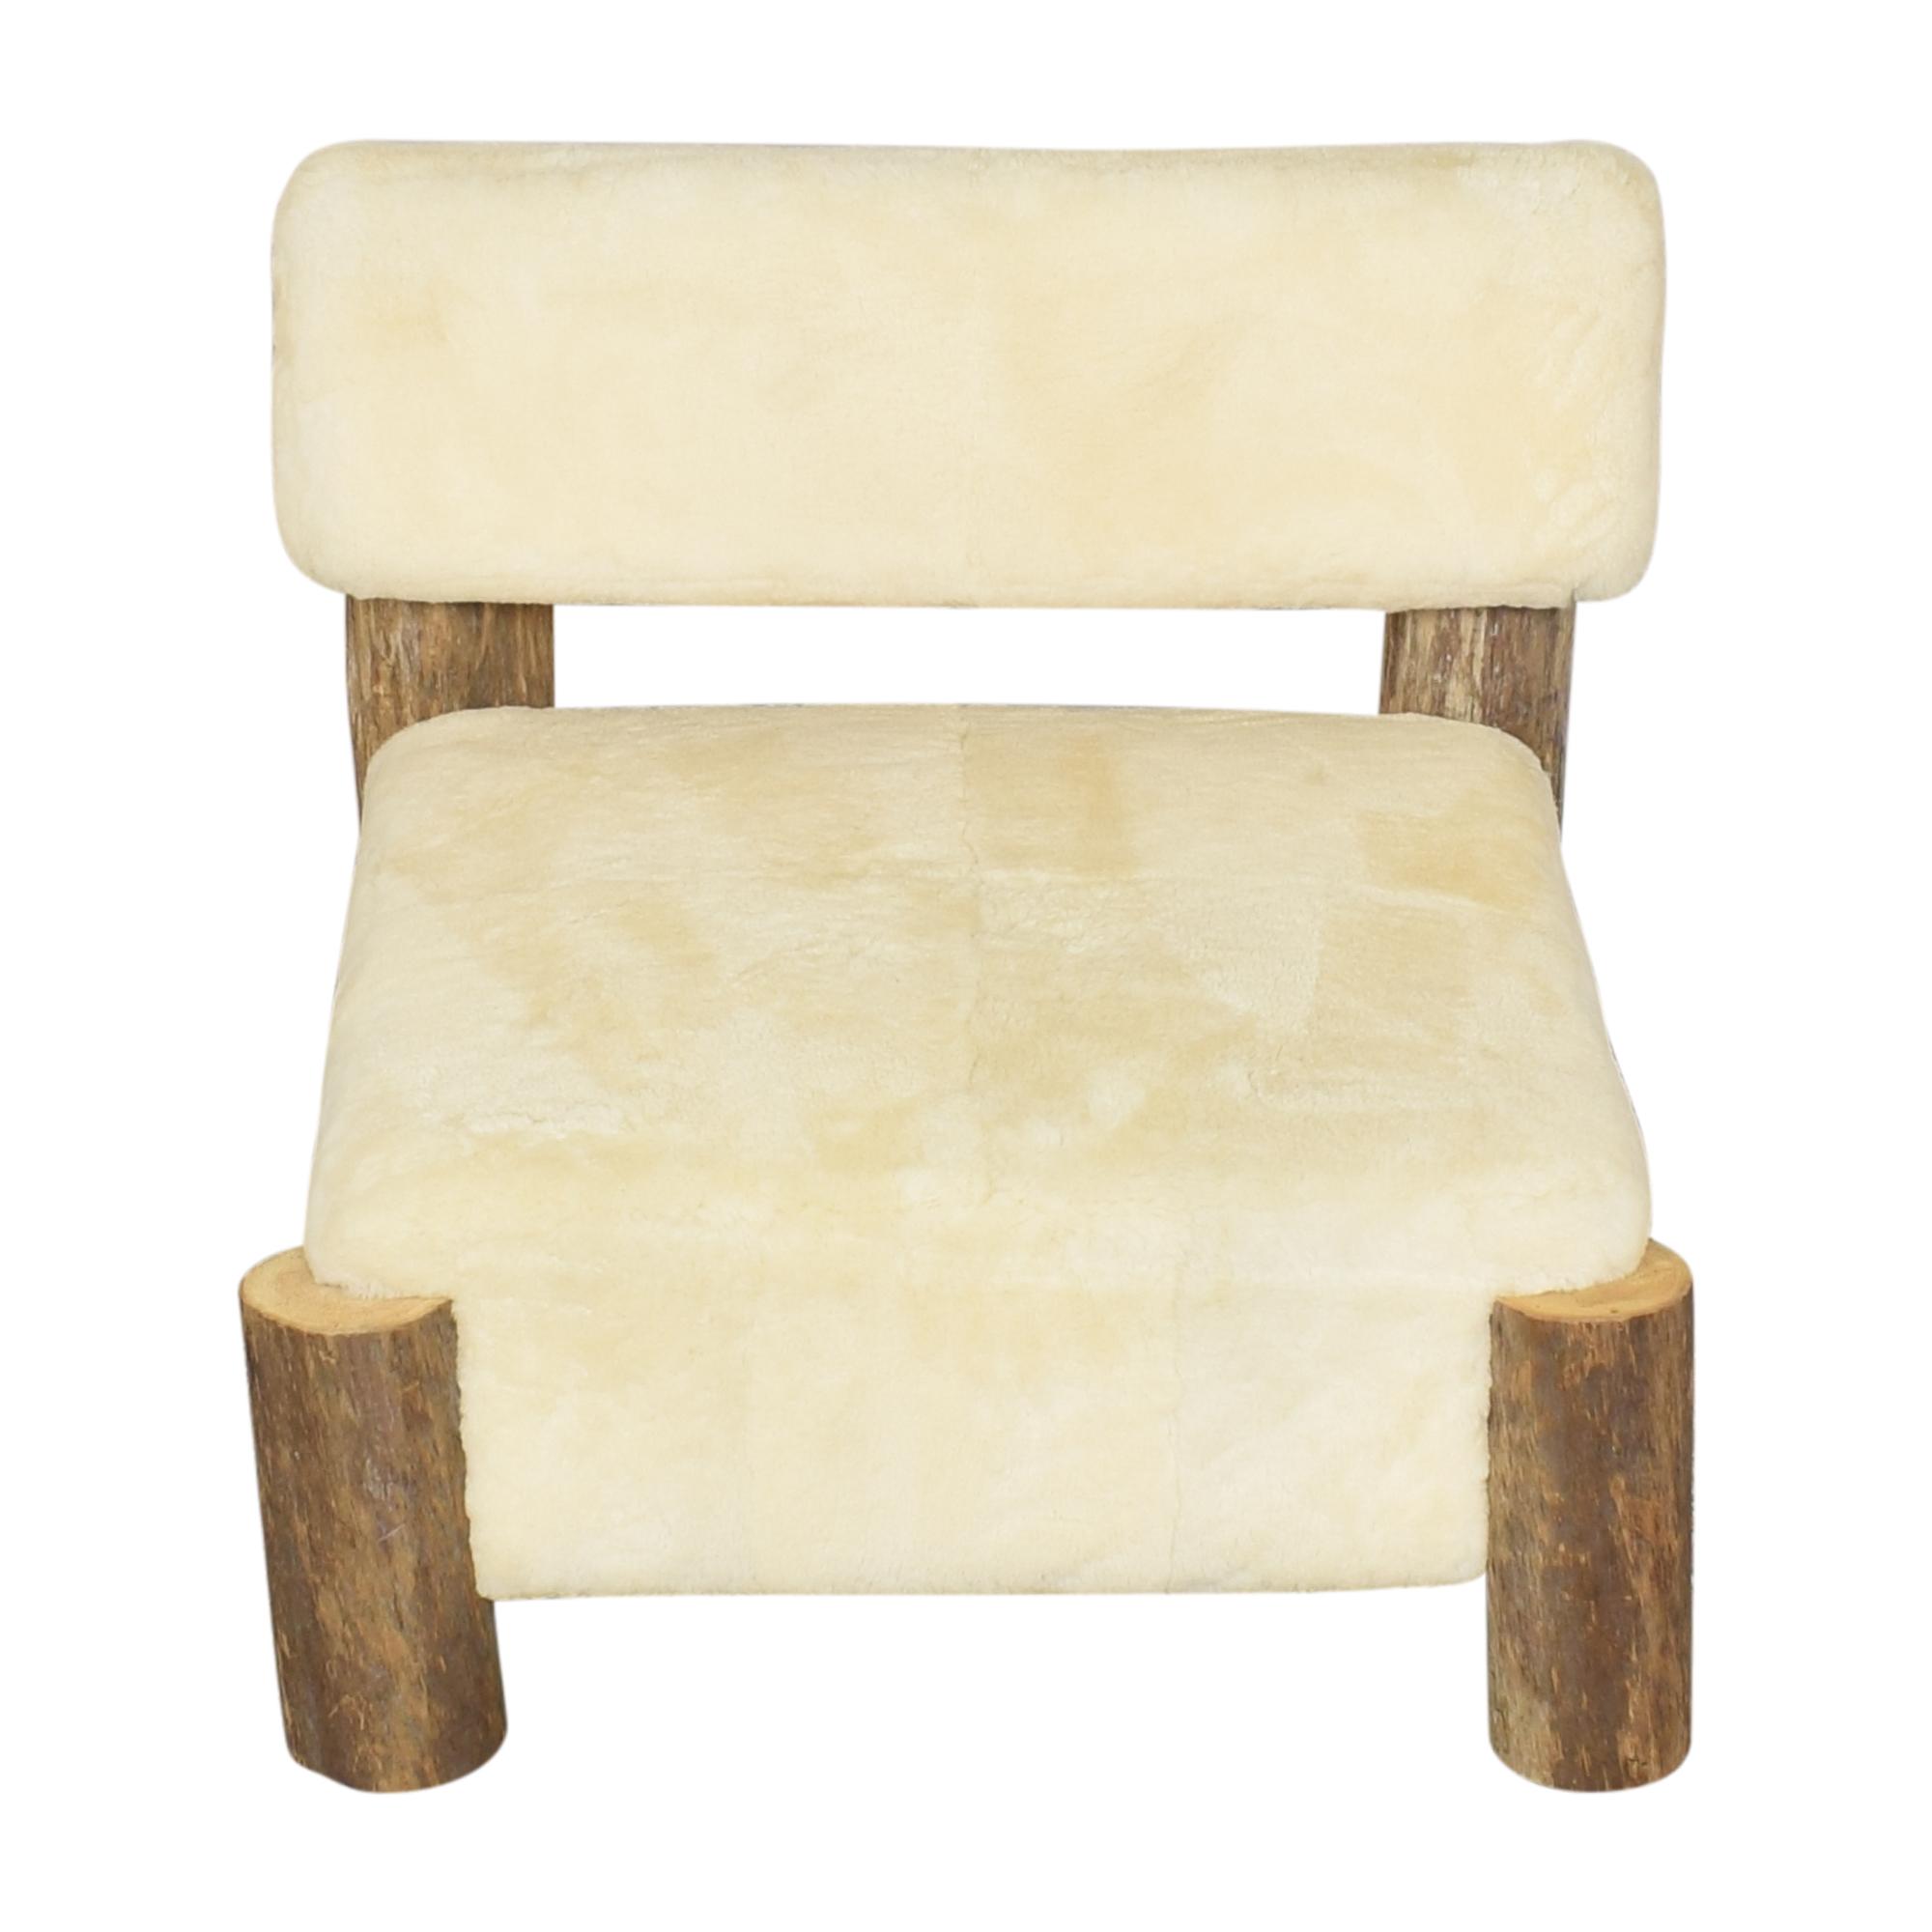 Four Hands Four Hands Tsalagi Slipper Chair for sale